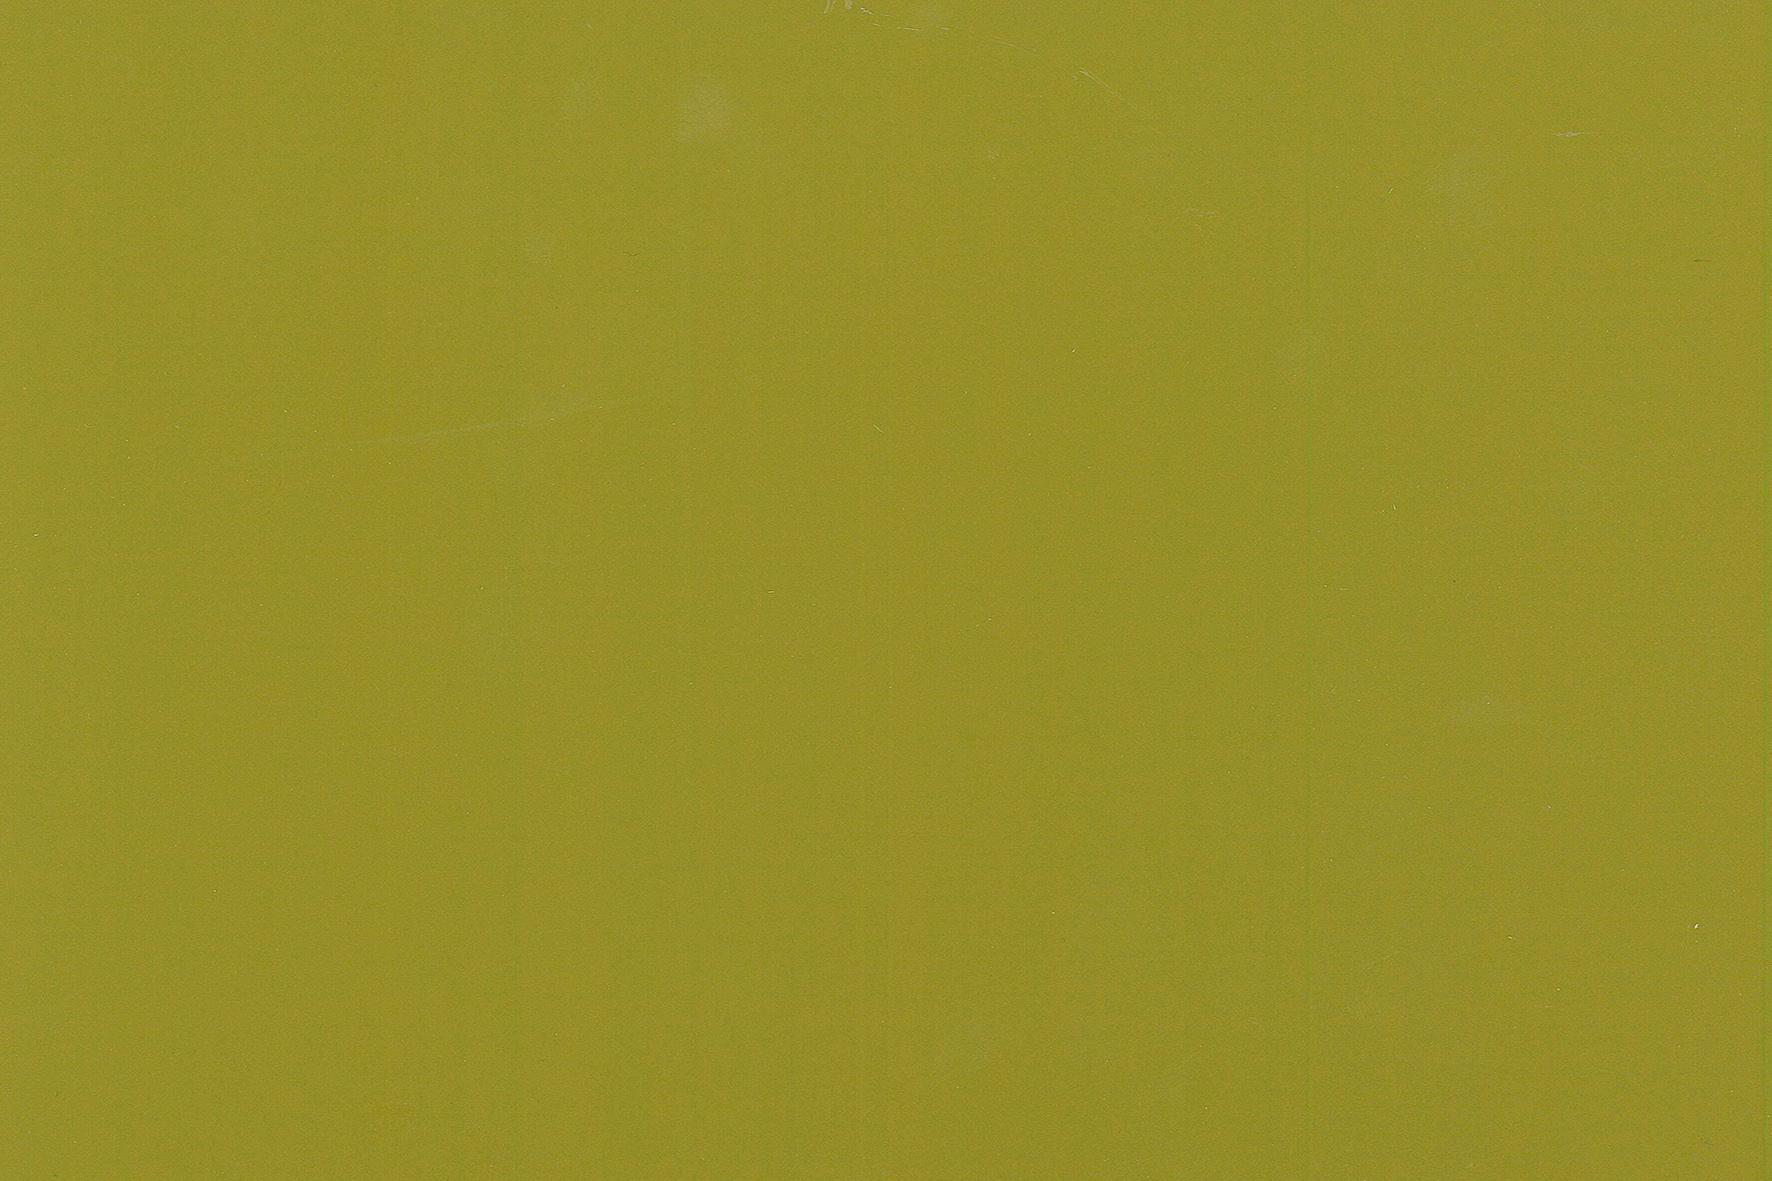 оливково зеленый